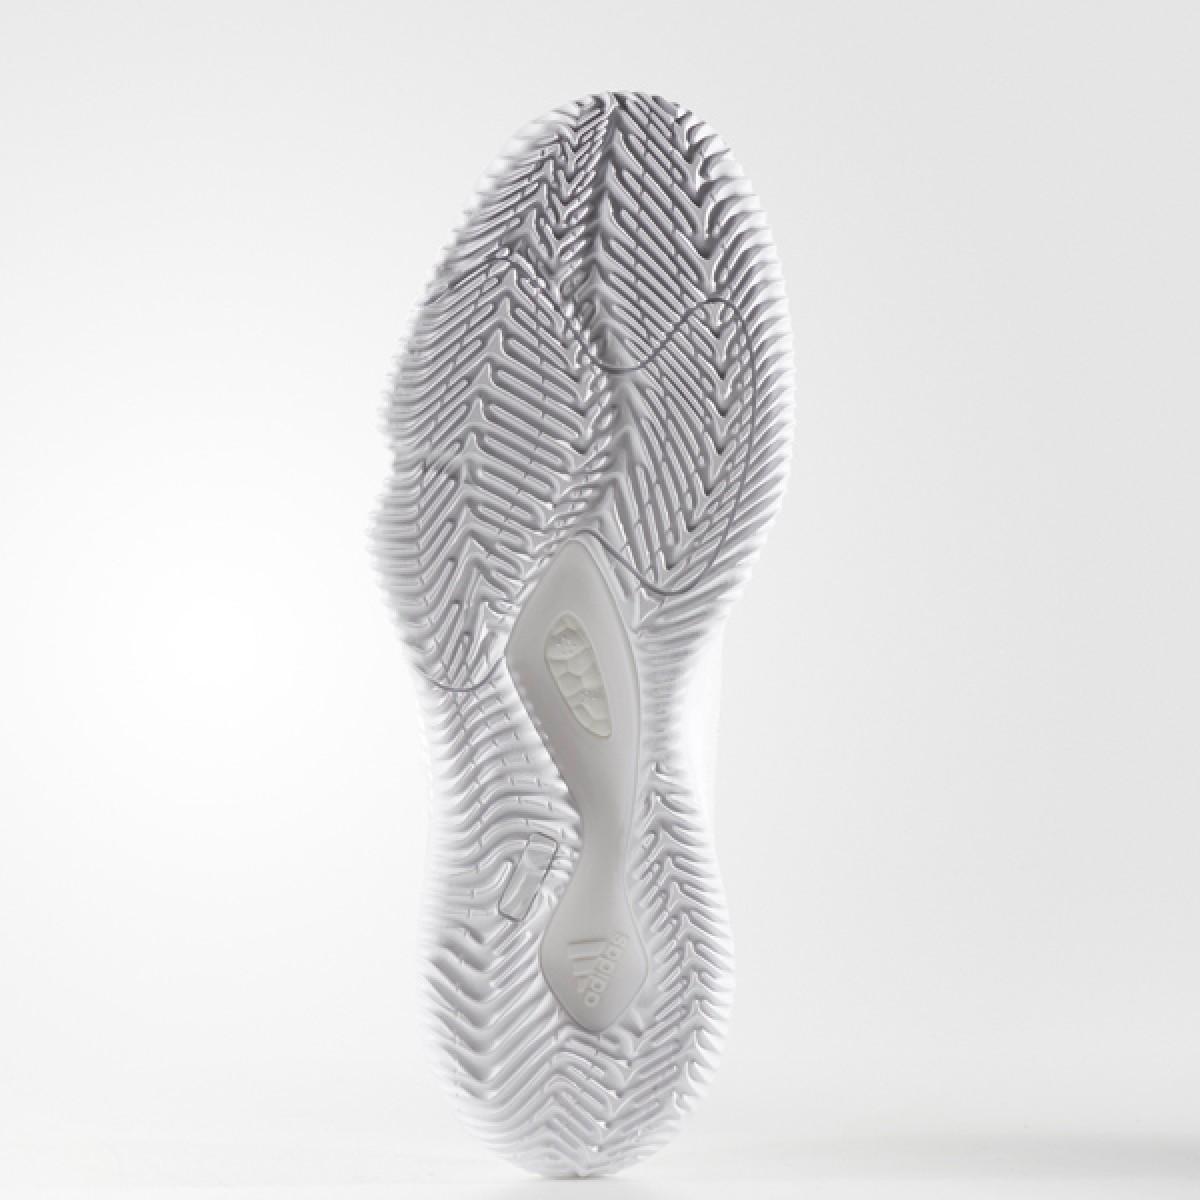 Adidas Crazy Light Boost 2016 'White Cream' CQ1198